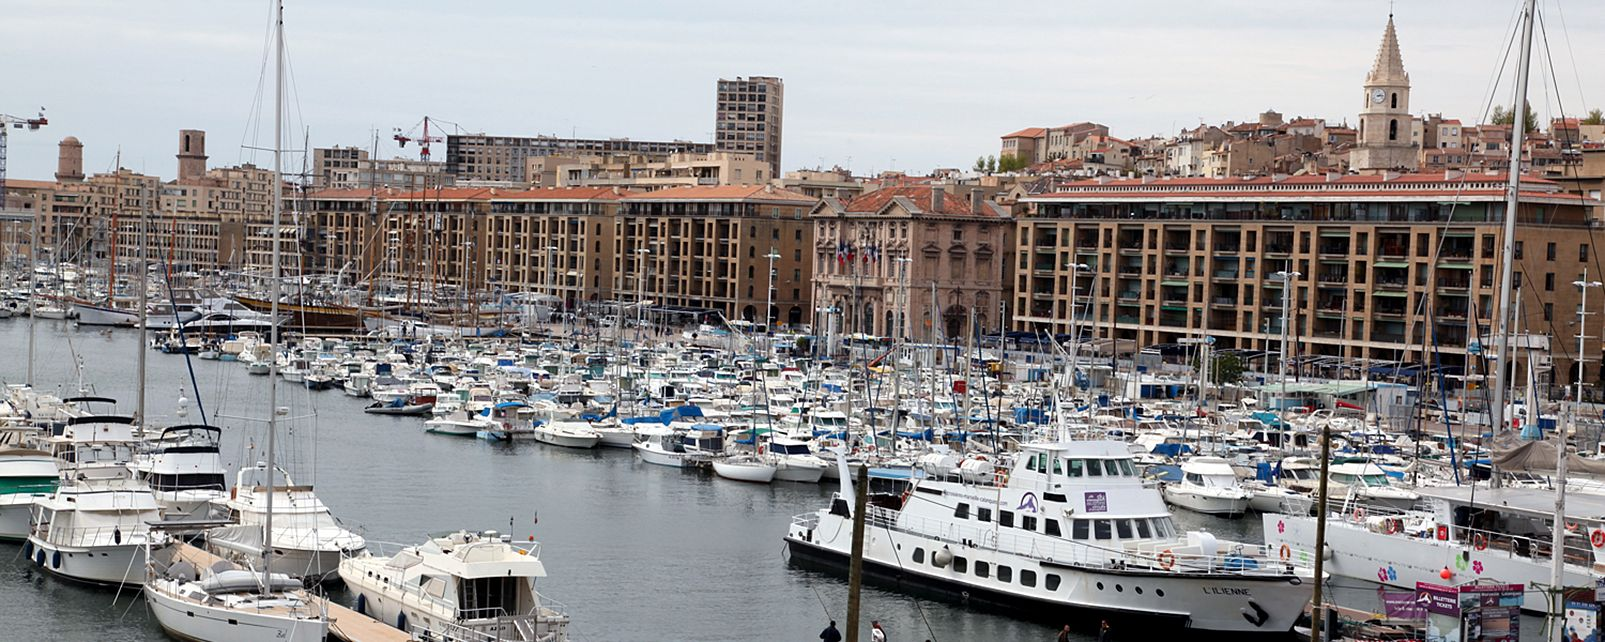 Grand Beauvau Marseille Vieux Port - Hotel marseille vieux port pas cher